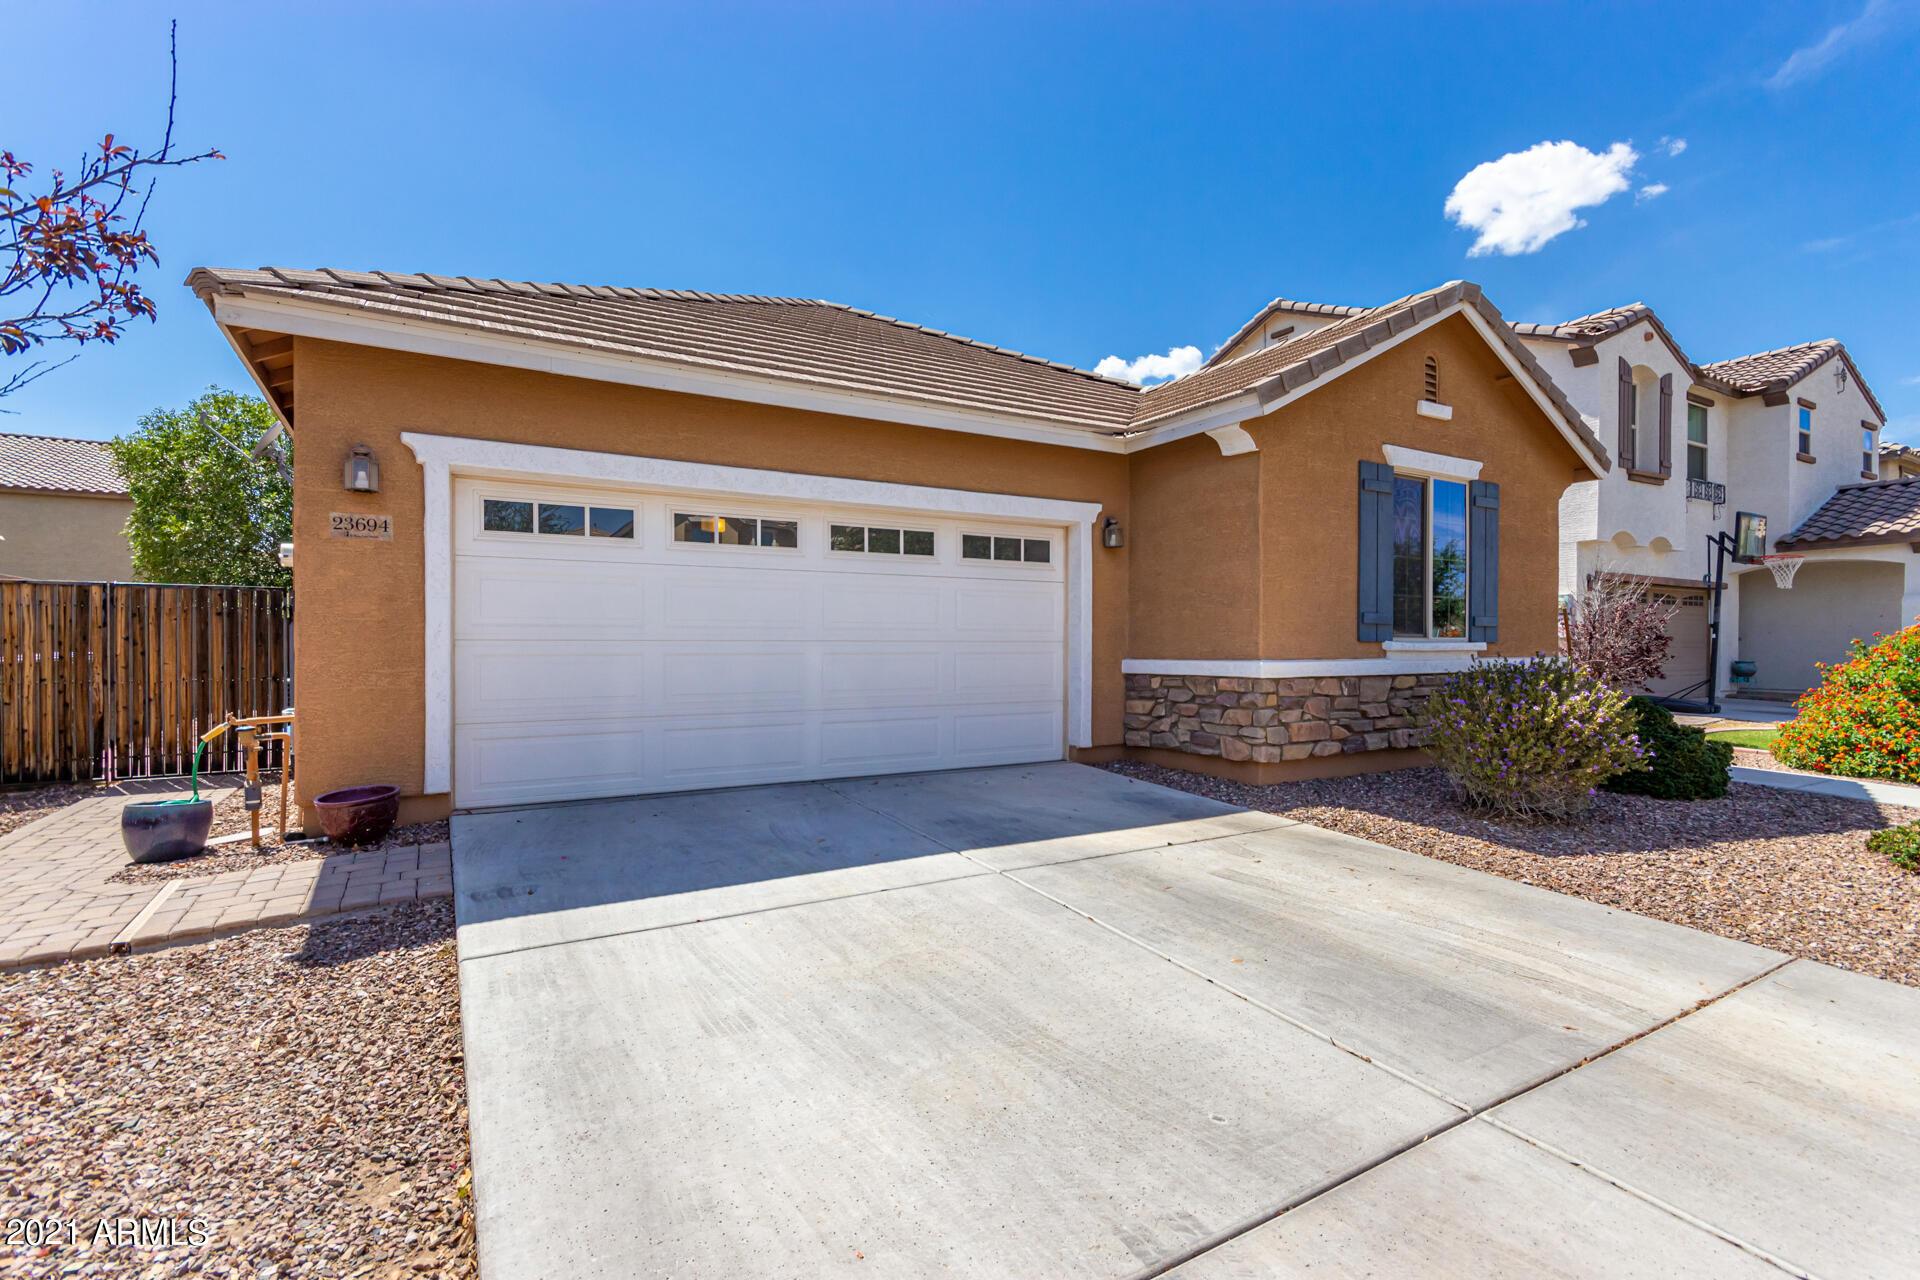 23694 210TH Place, Queen Creek, Arizona 85142, 3 Bedrooms Bedrooms, ,1.75 BathroomsBathrooms,Residential,For Sale,210TH,6238269